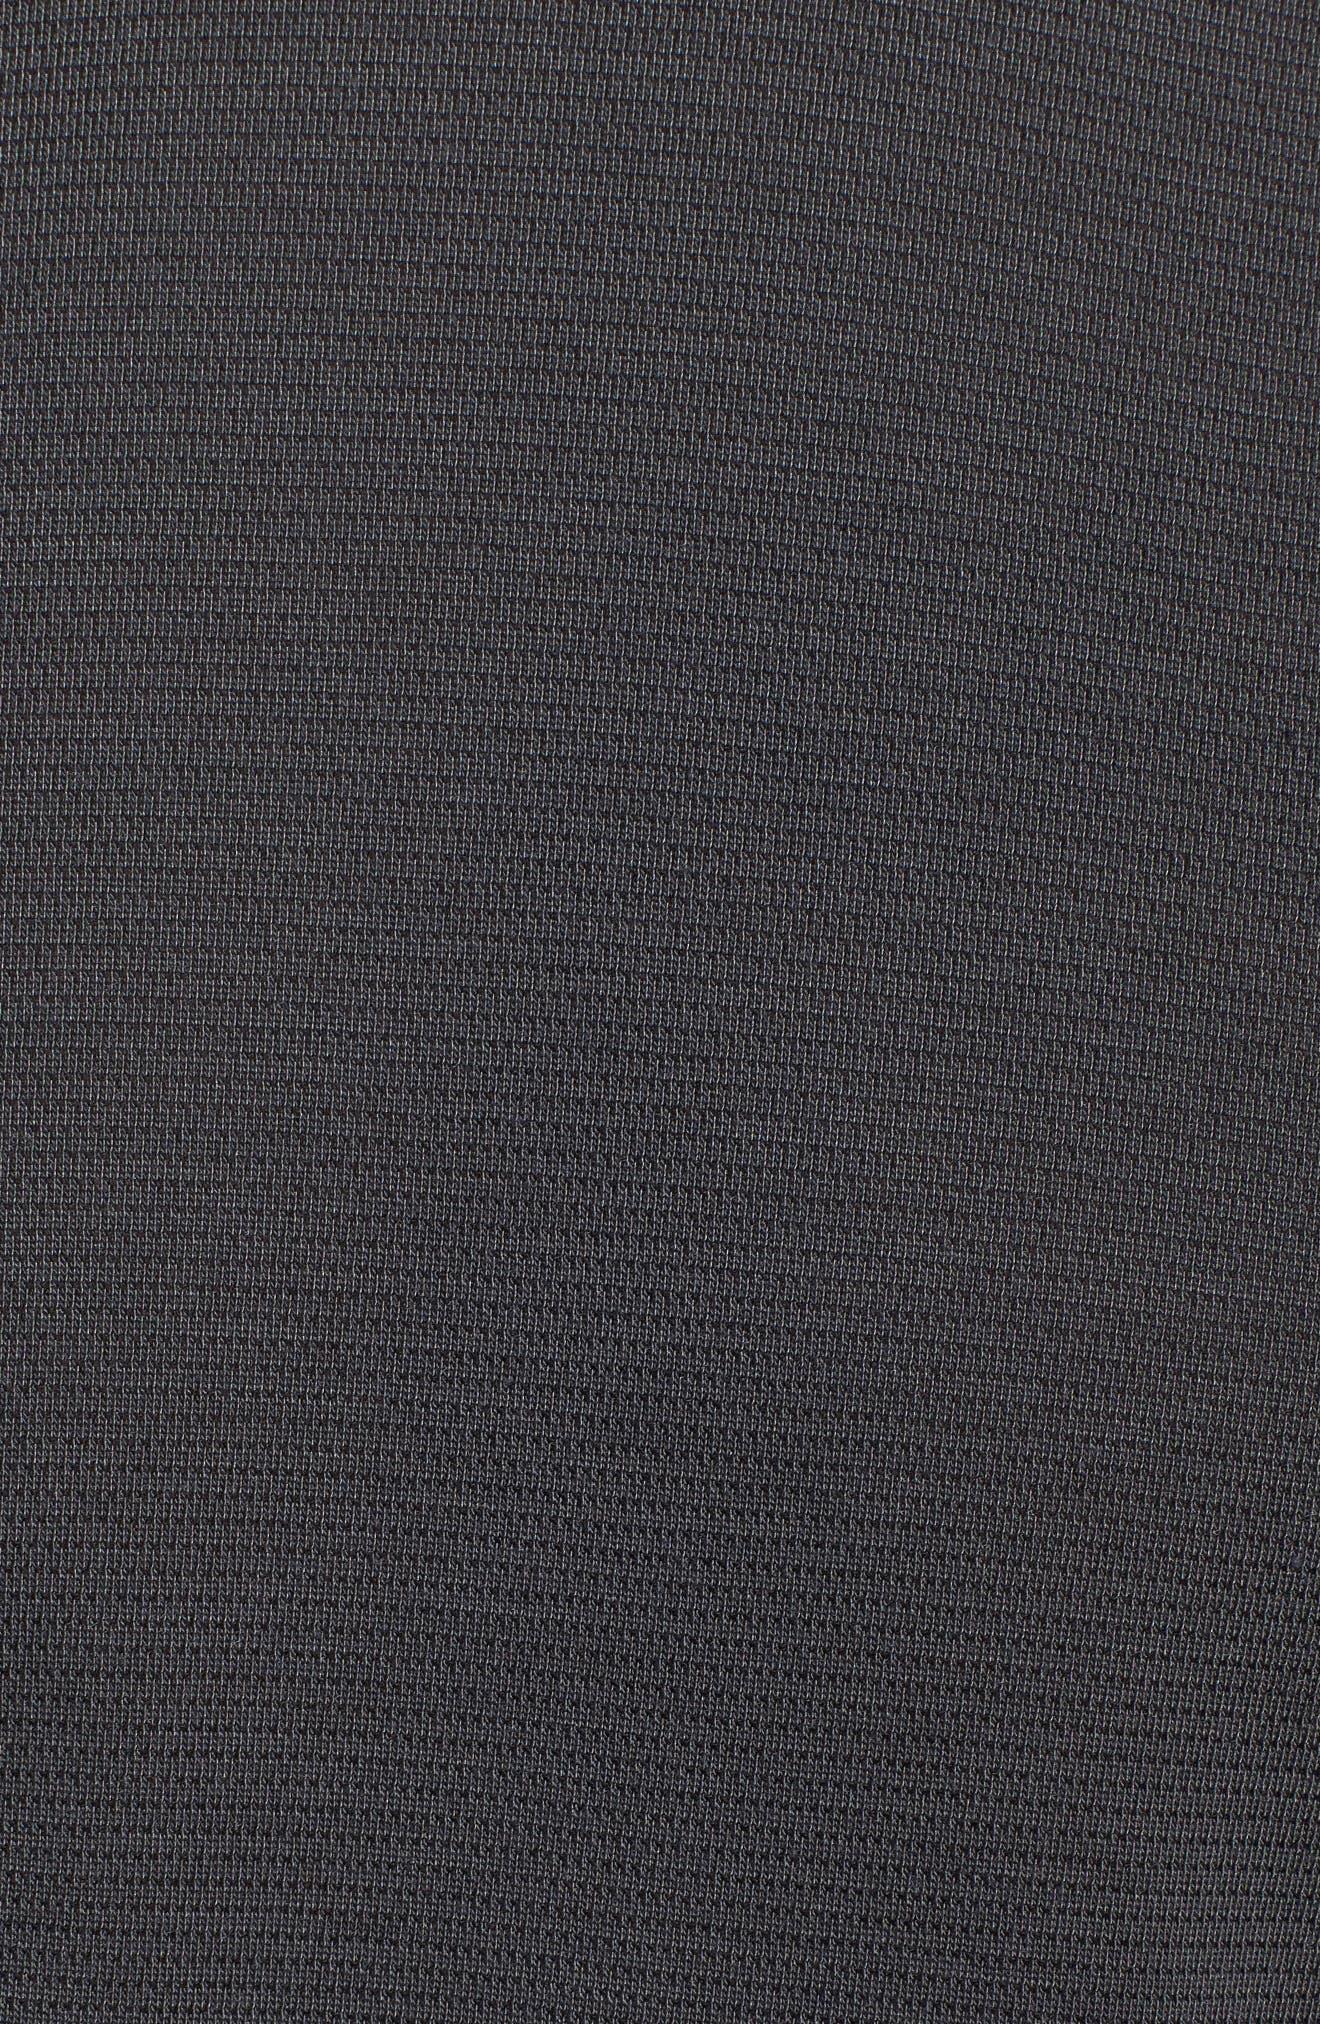 Threadborne Performance T-Shirt,                             Alternate thumbnail 5, color,                             020